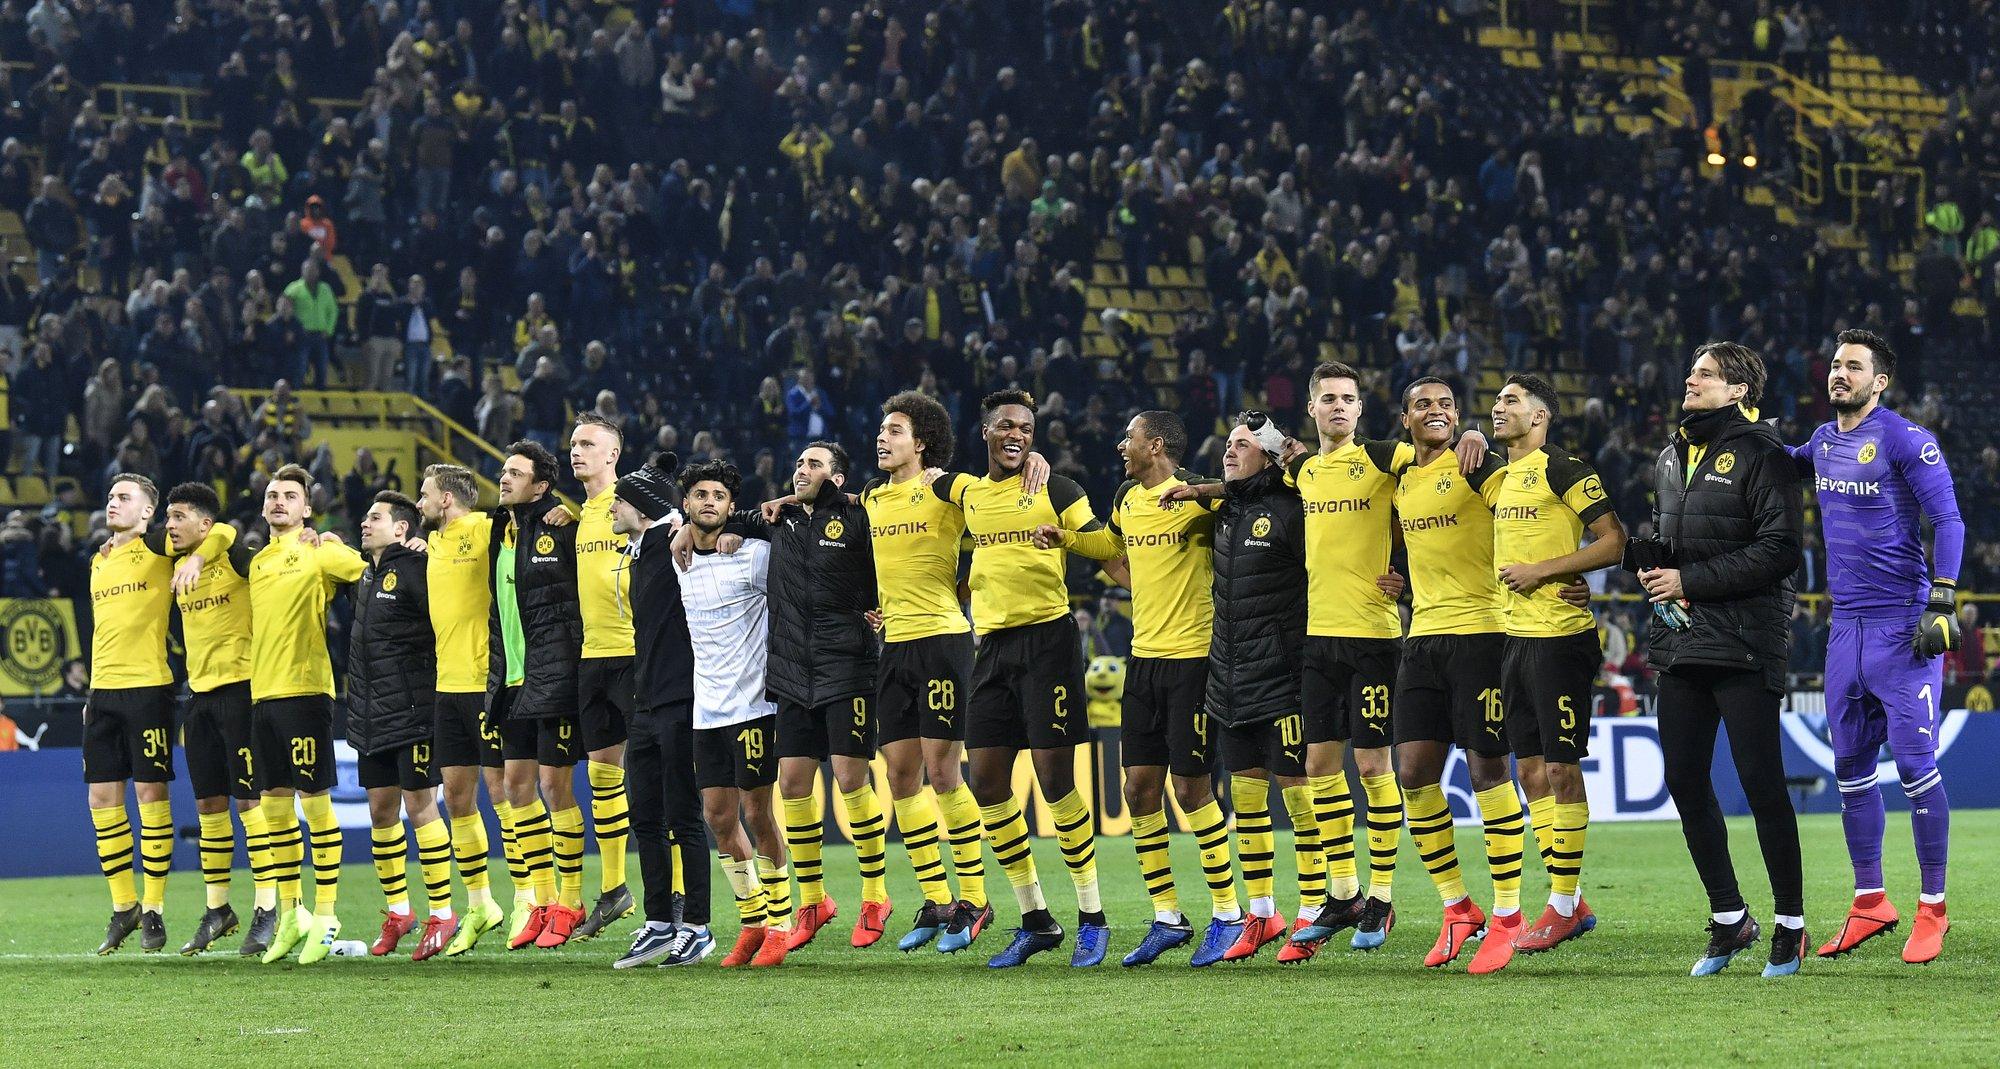 Dortmund beats Leverkusen to get back on track in Bundesliga